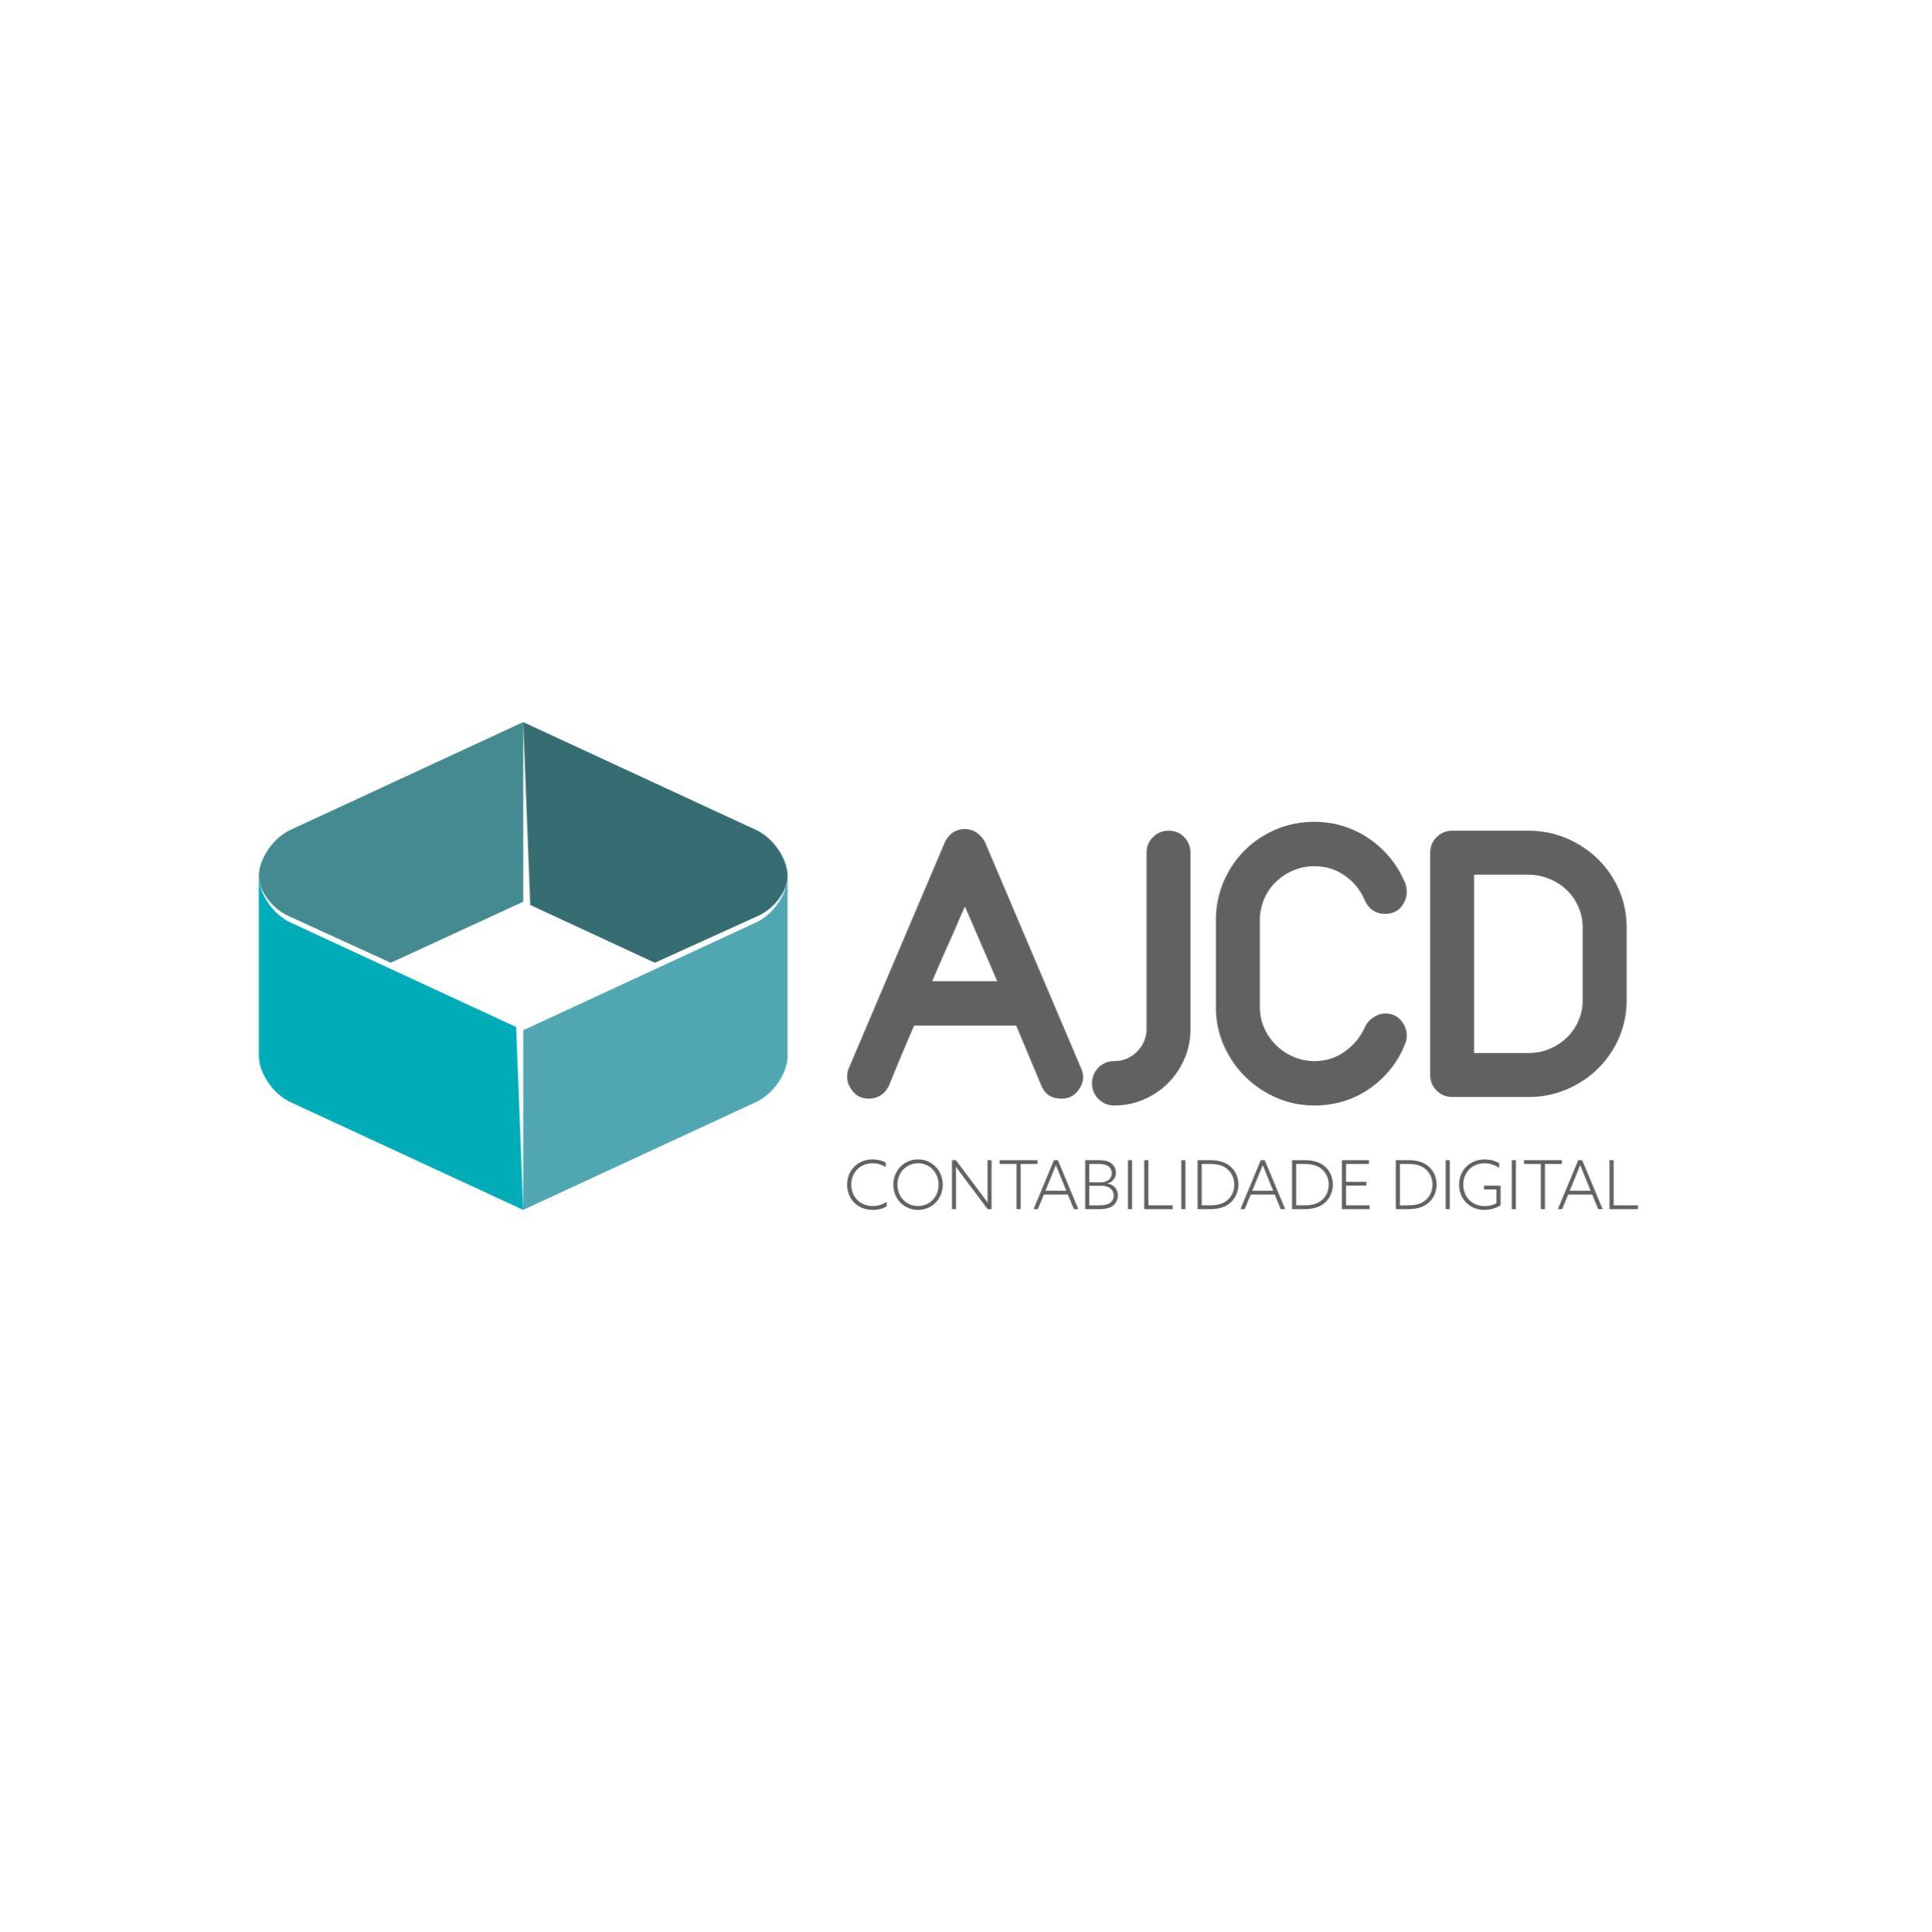 Ajcd Contabilidade Digital